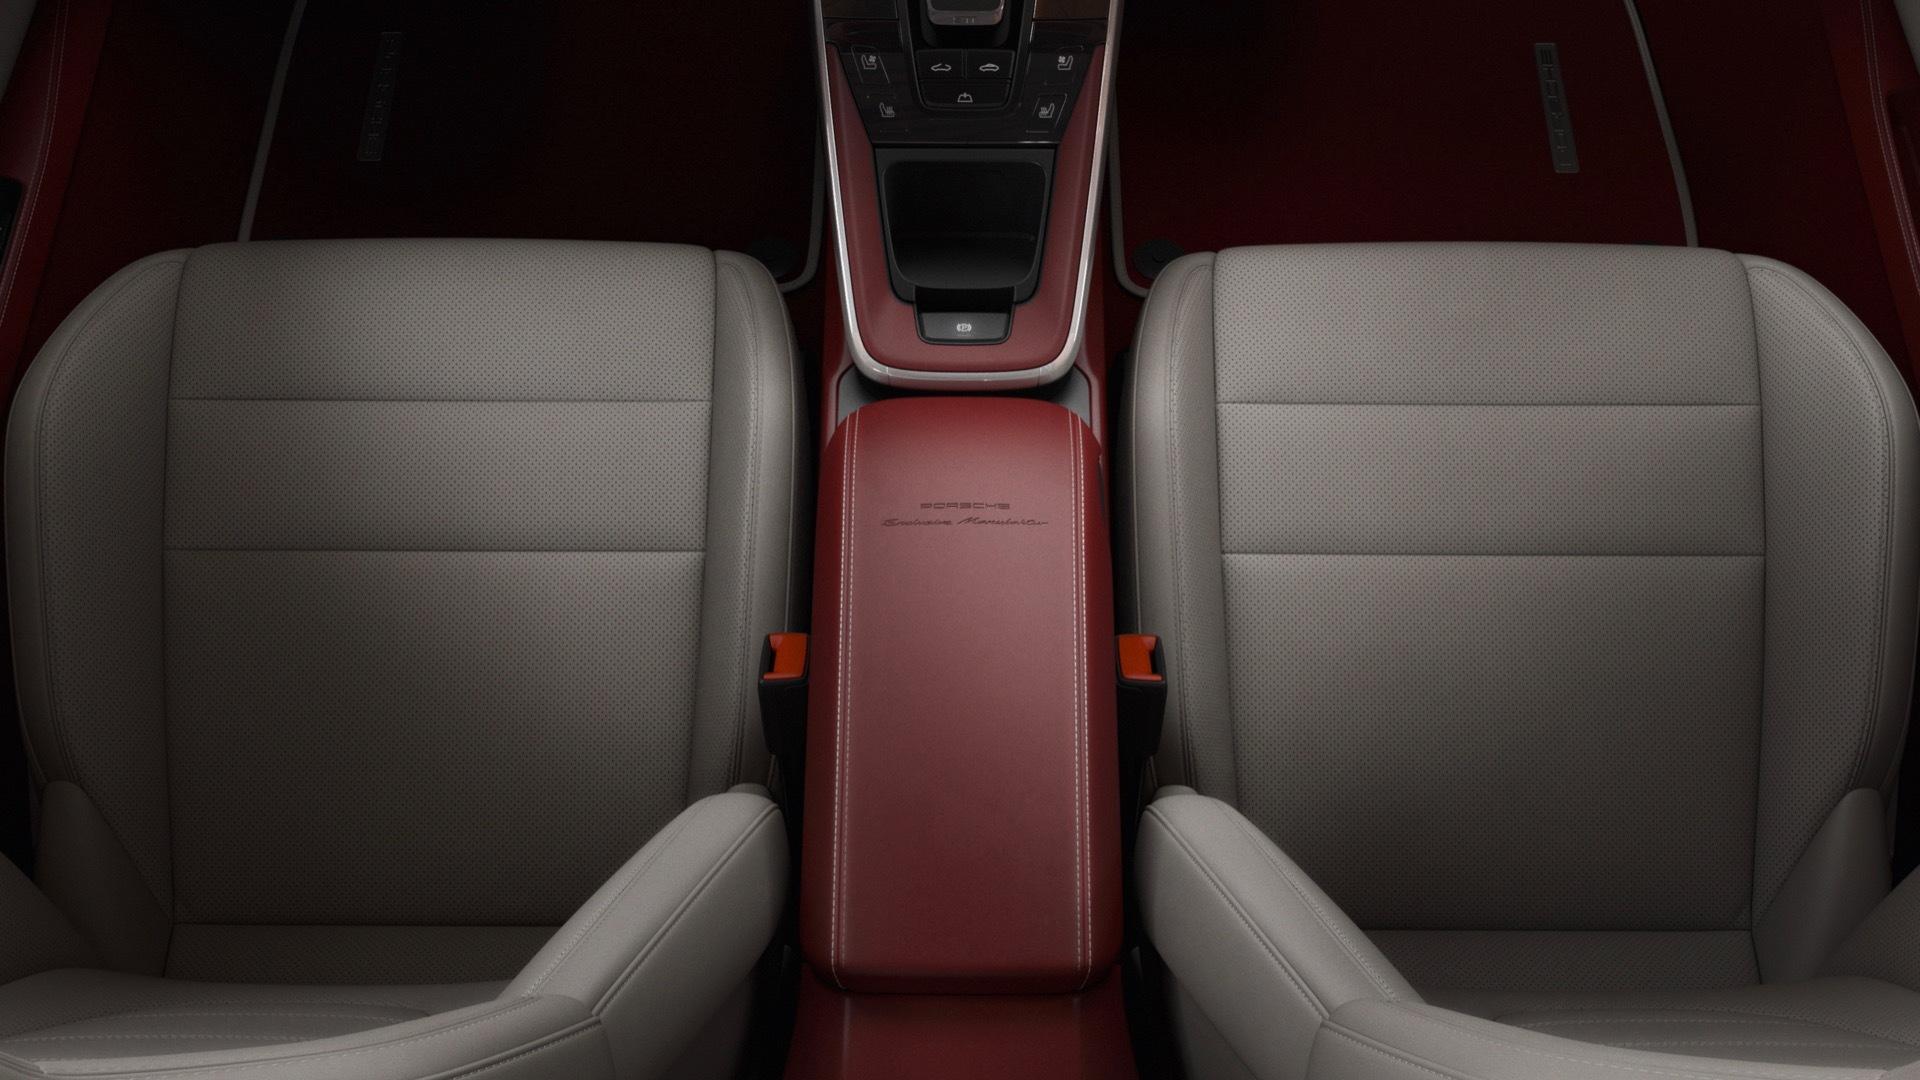 Porsche 911 992 two-tone interior